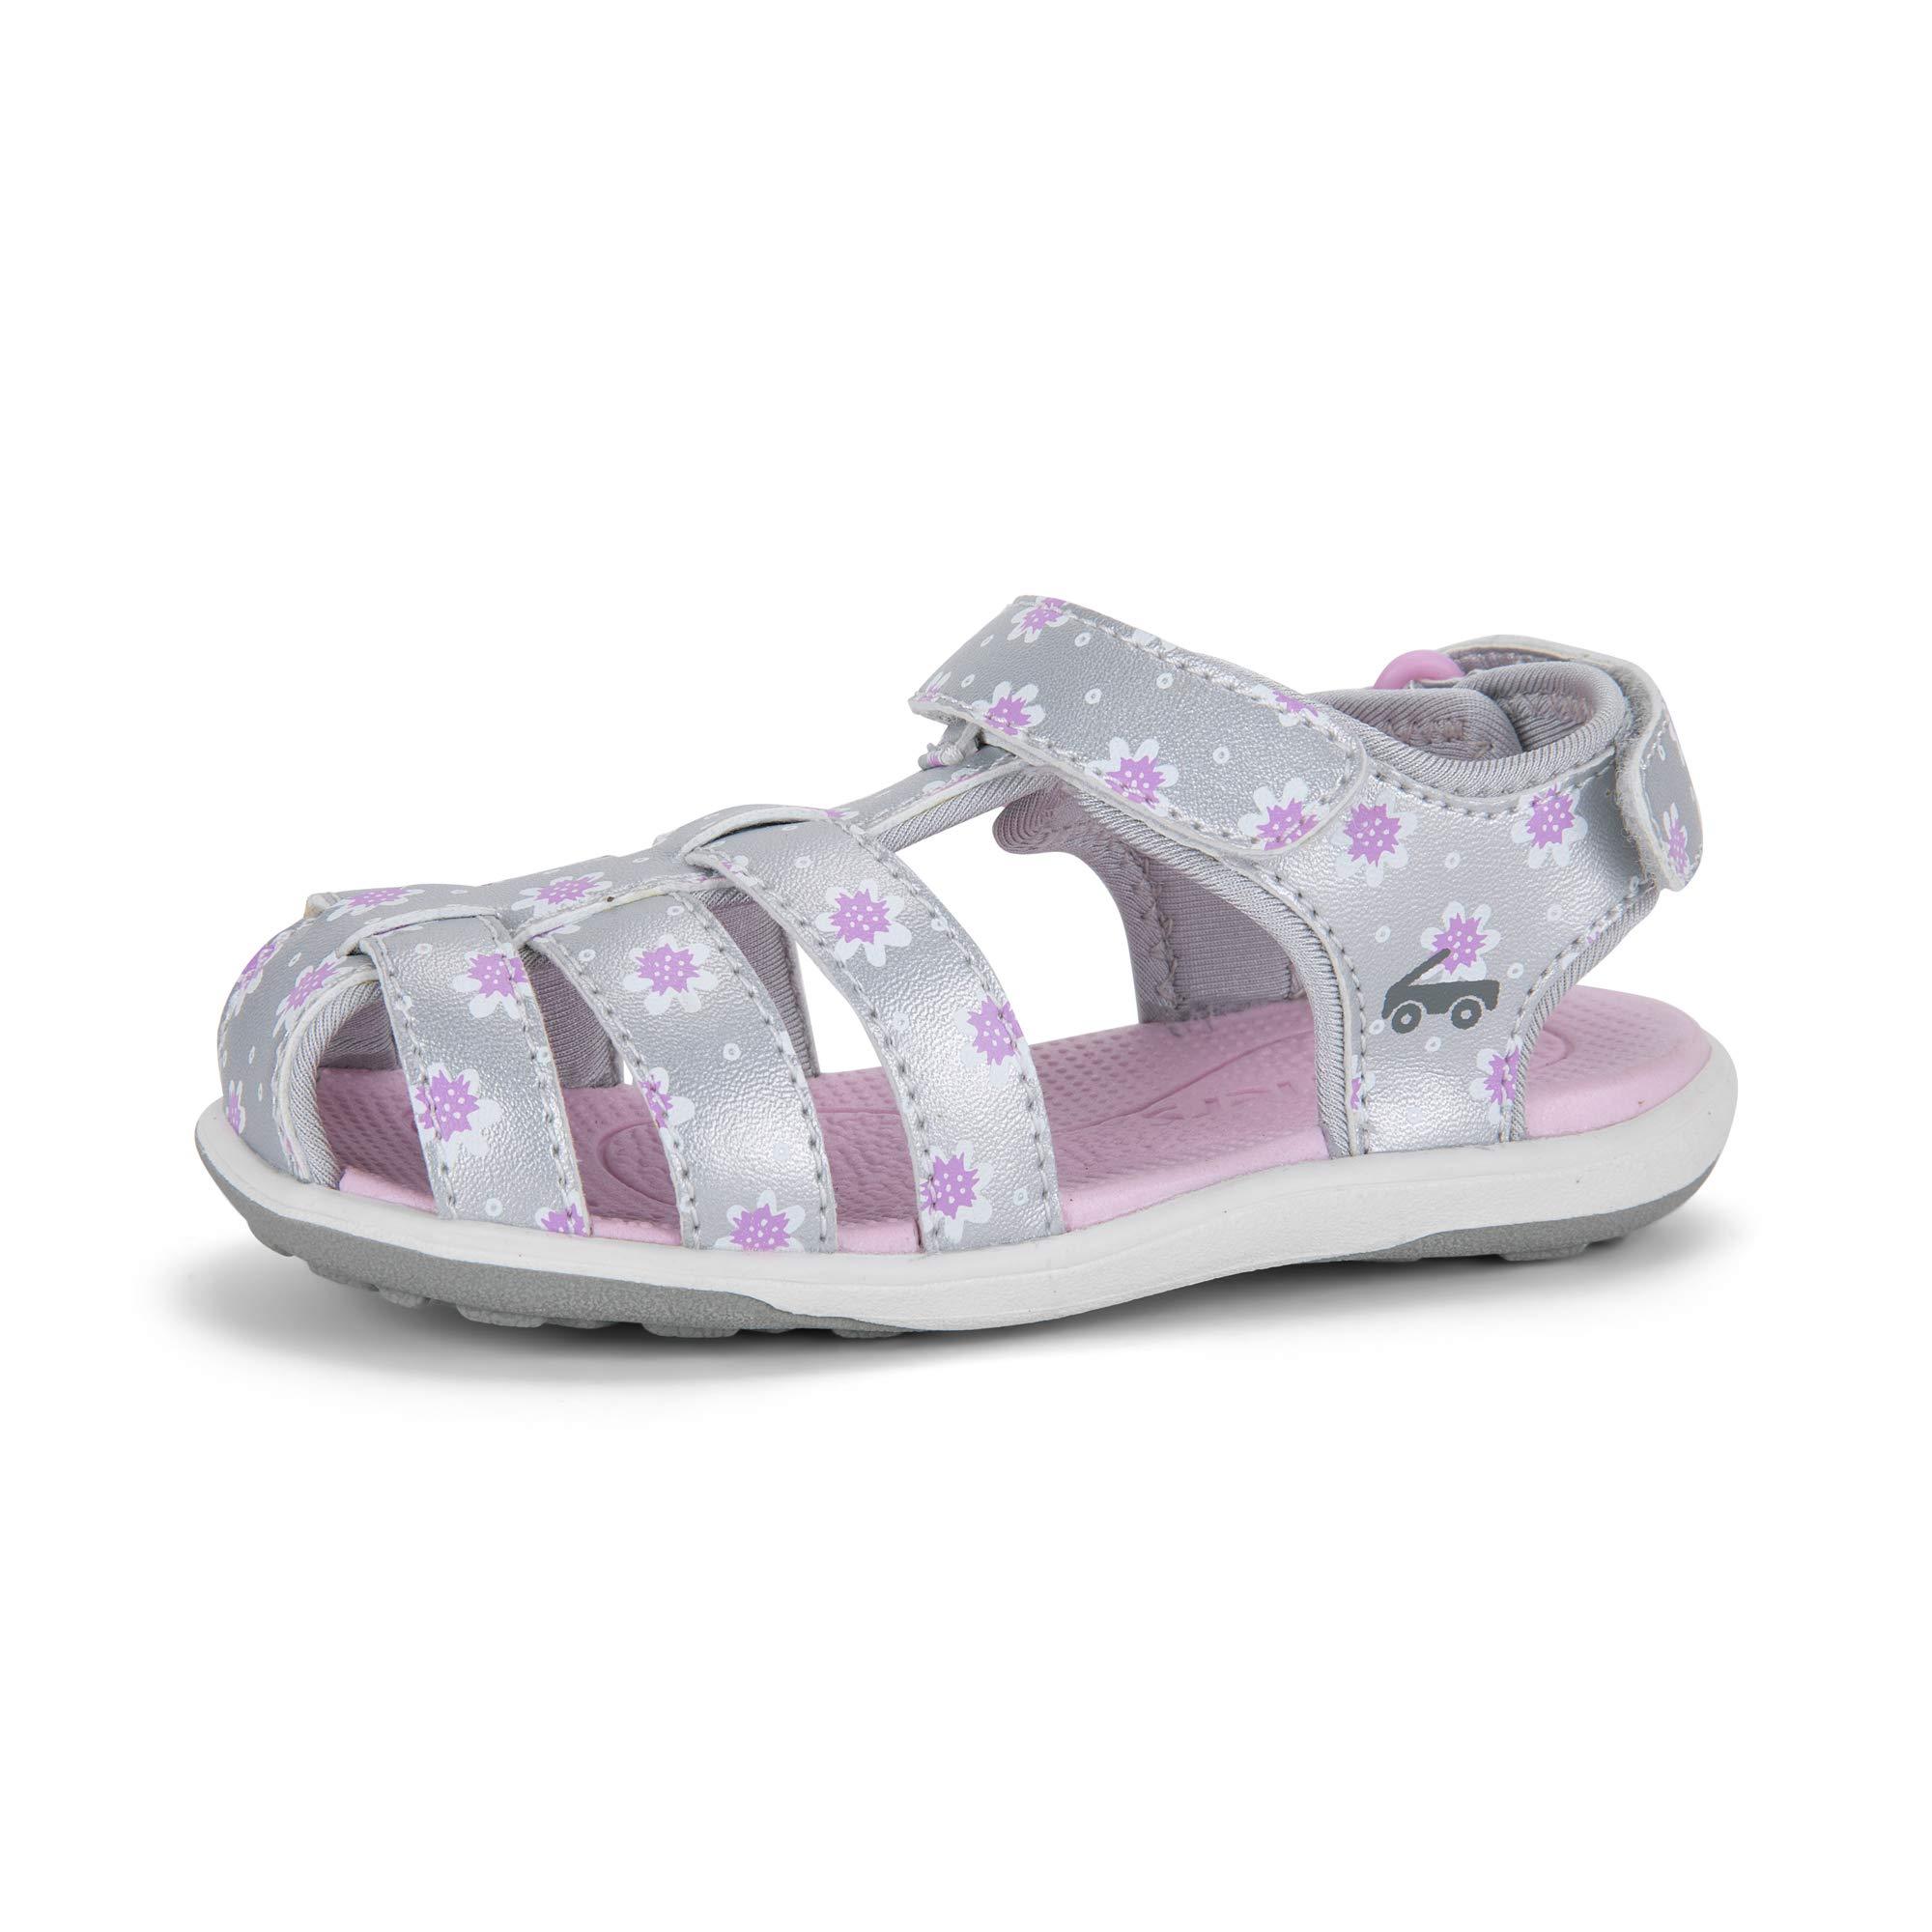 See Kai Run - Paley II Water-Friendly Sandals for Kids, Silver/Purple, 6 by See Kai Run